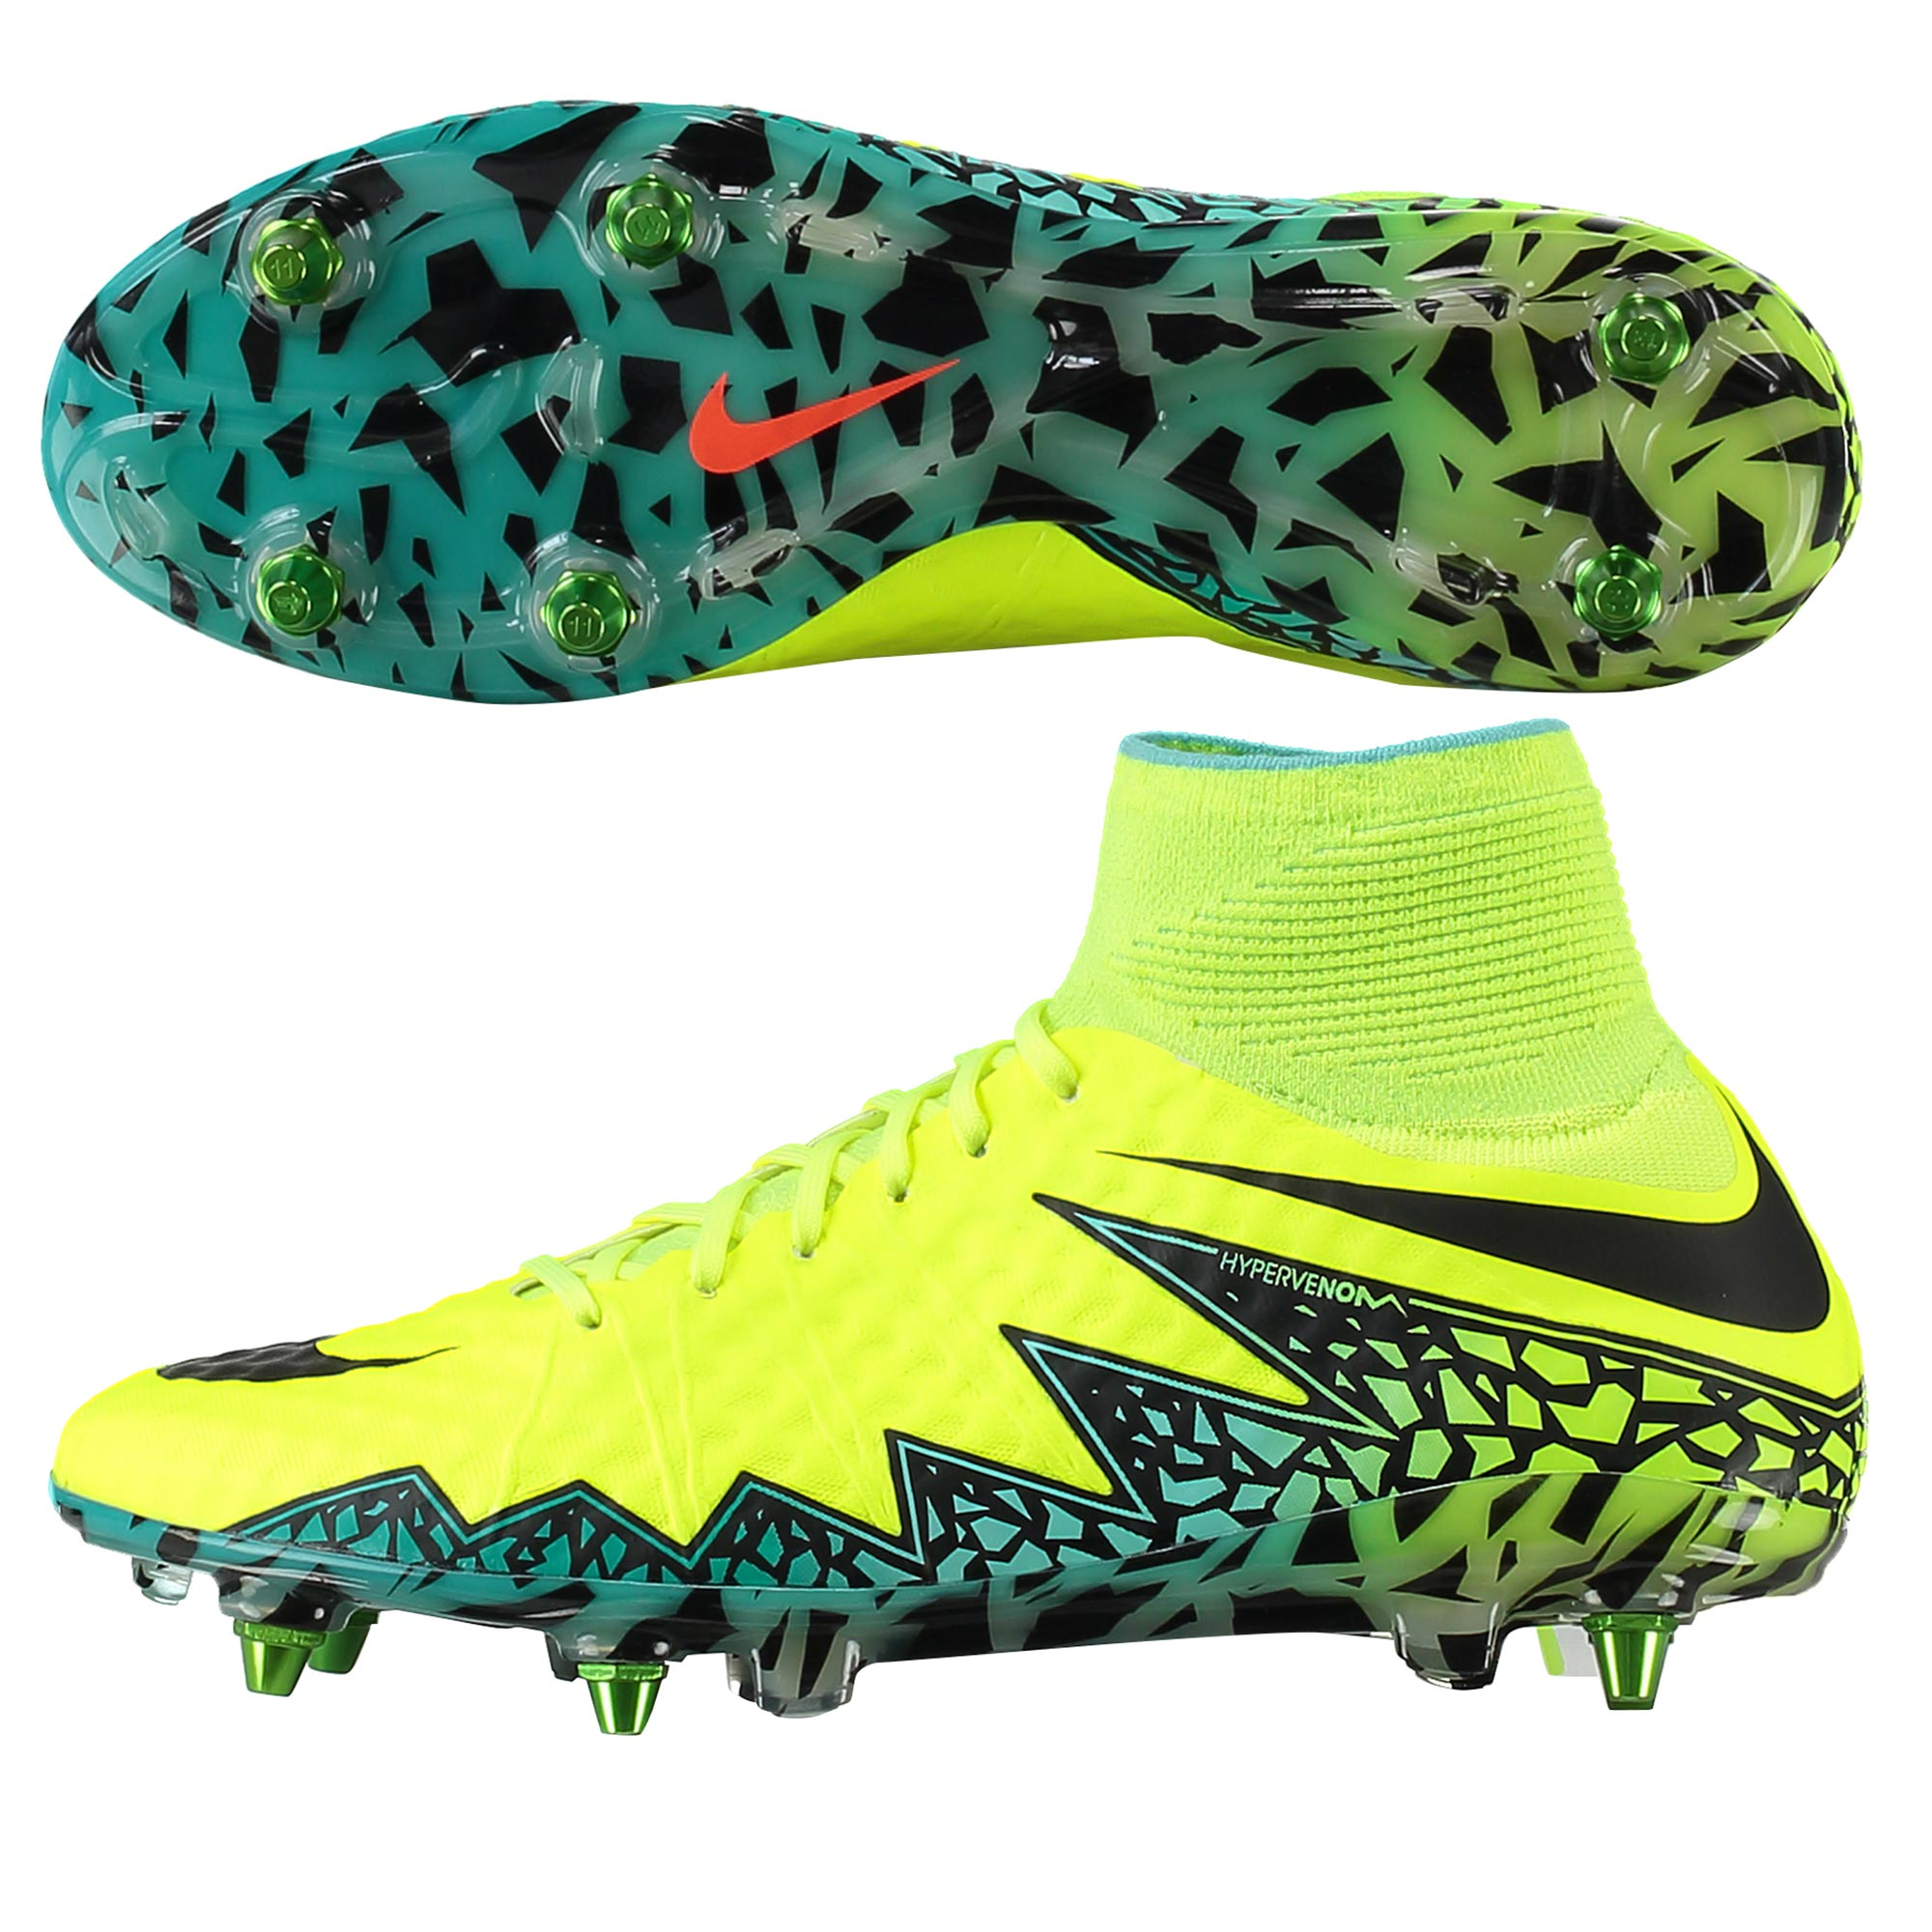 Nike Hypervenom Phantom II Soft Ground-Pro Football Boots - Volt/Black